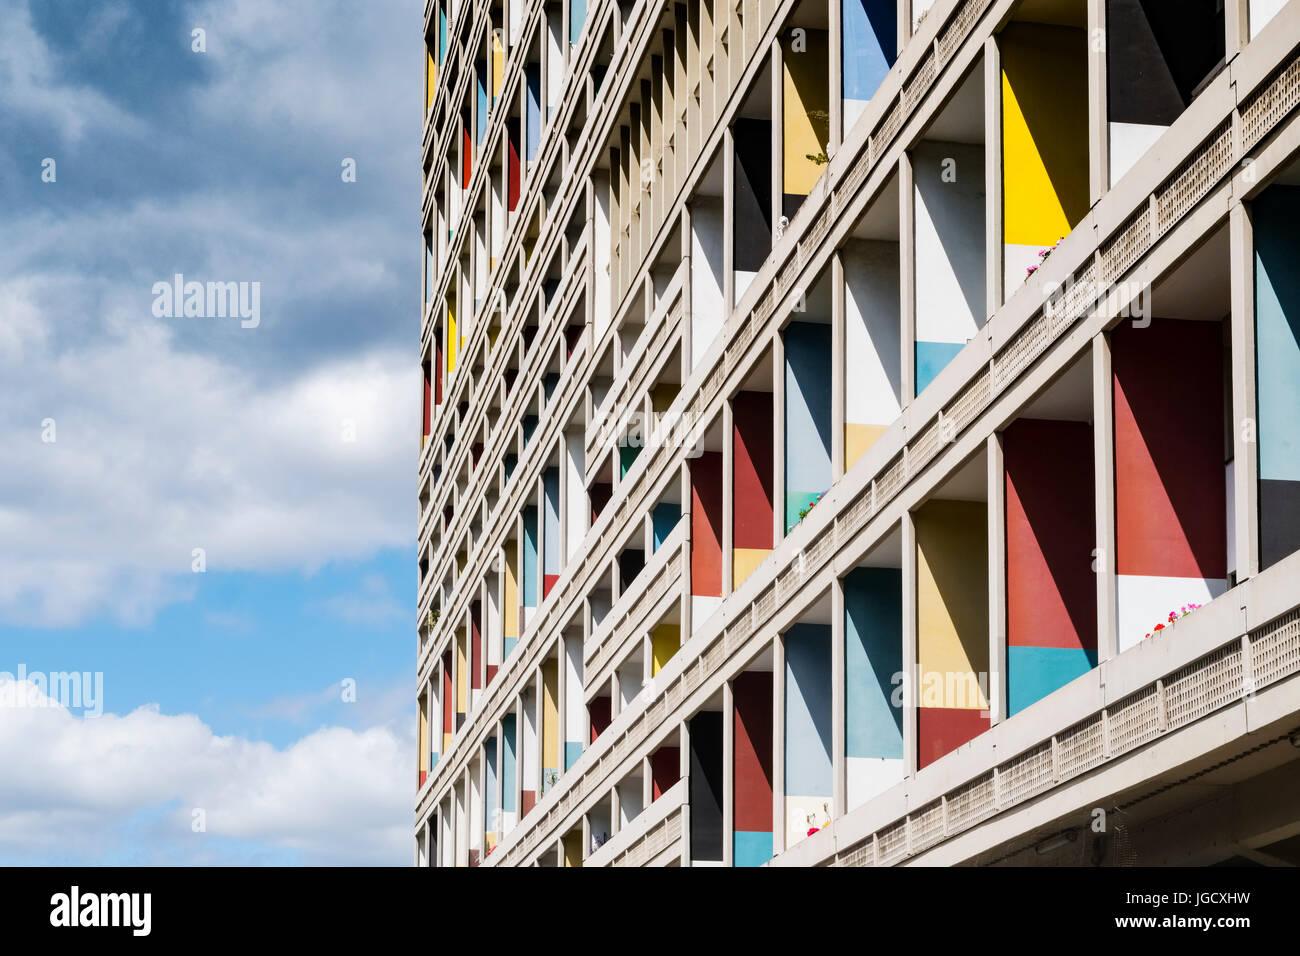 External view of Corbusierhaus modernist apartment building built as Unite d'Habitation in Berlin, Germany - Stock Image